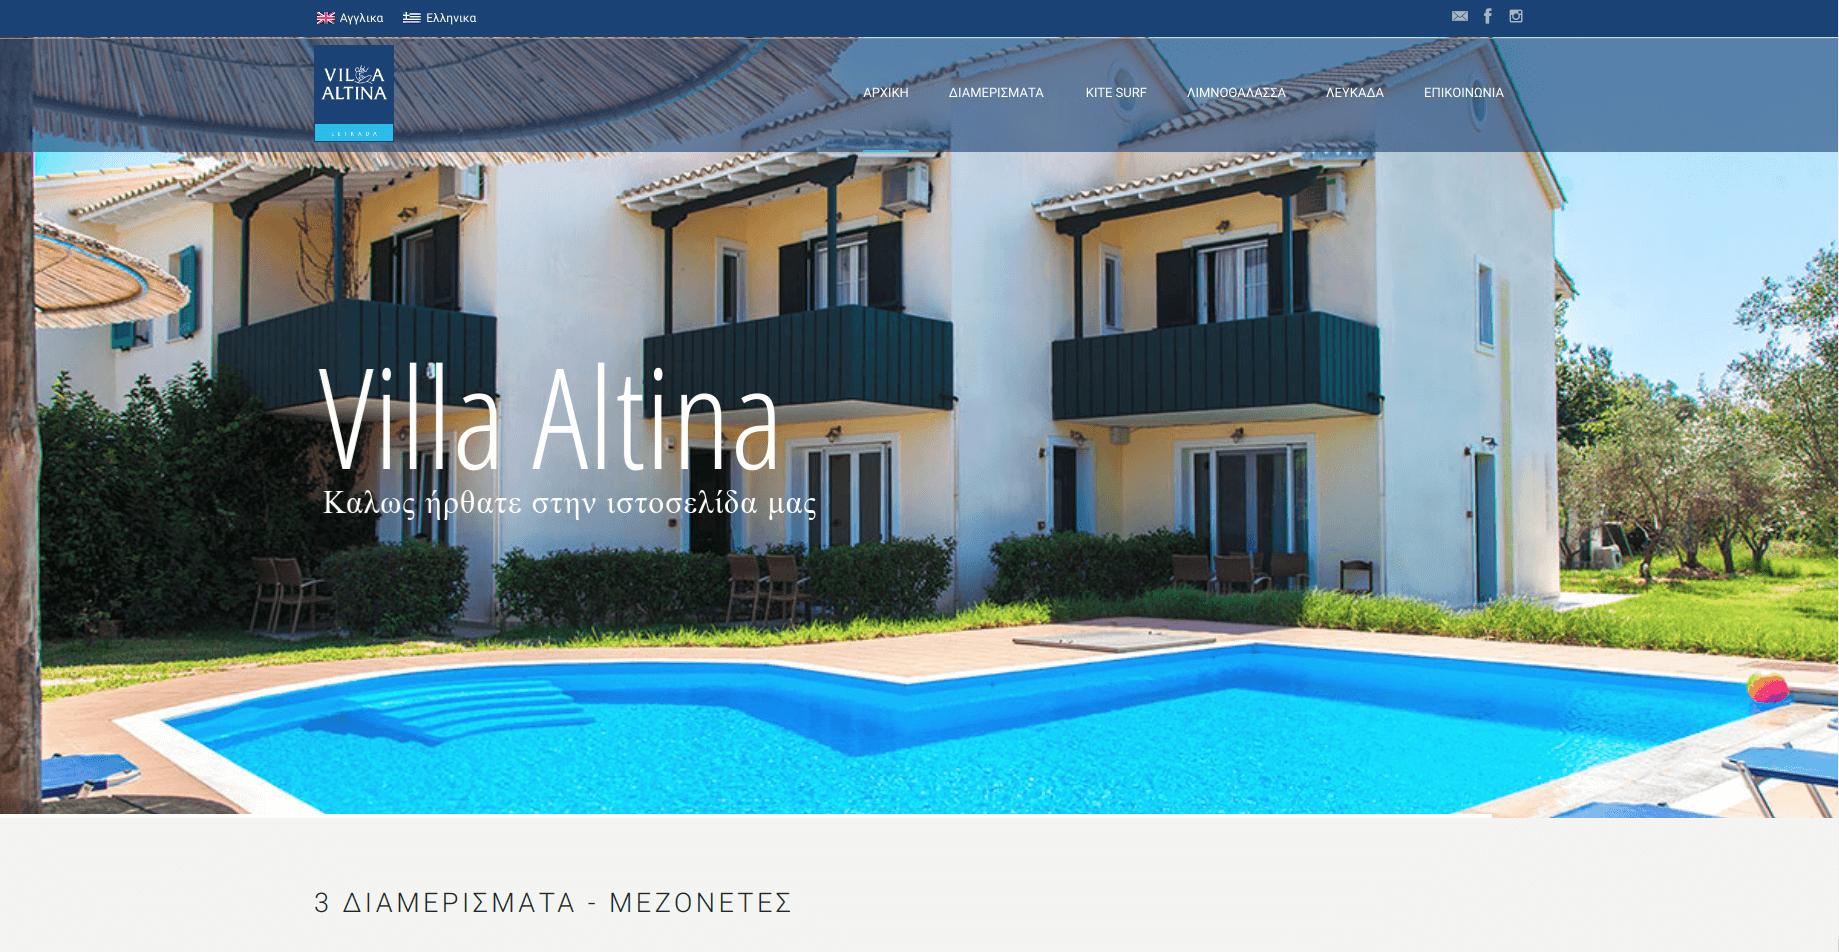 infinity-web-lefkada-villa-altina